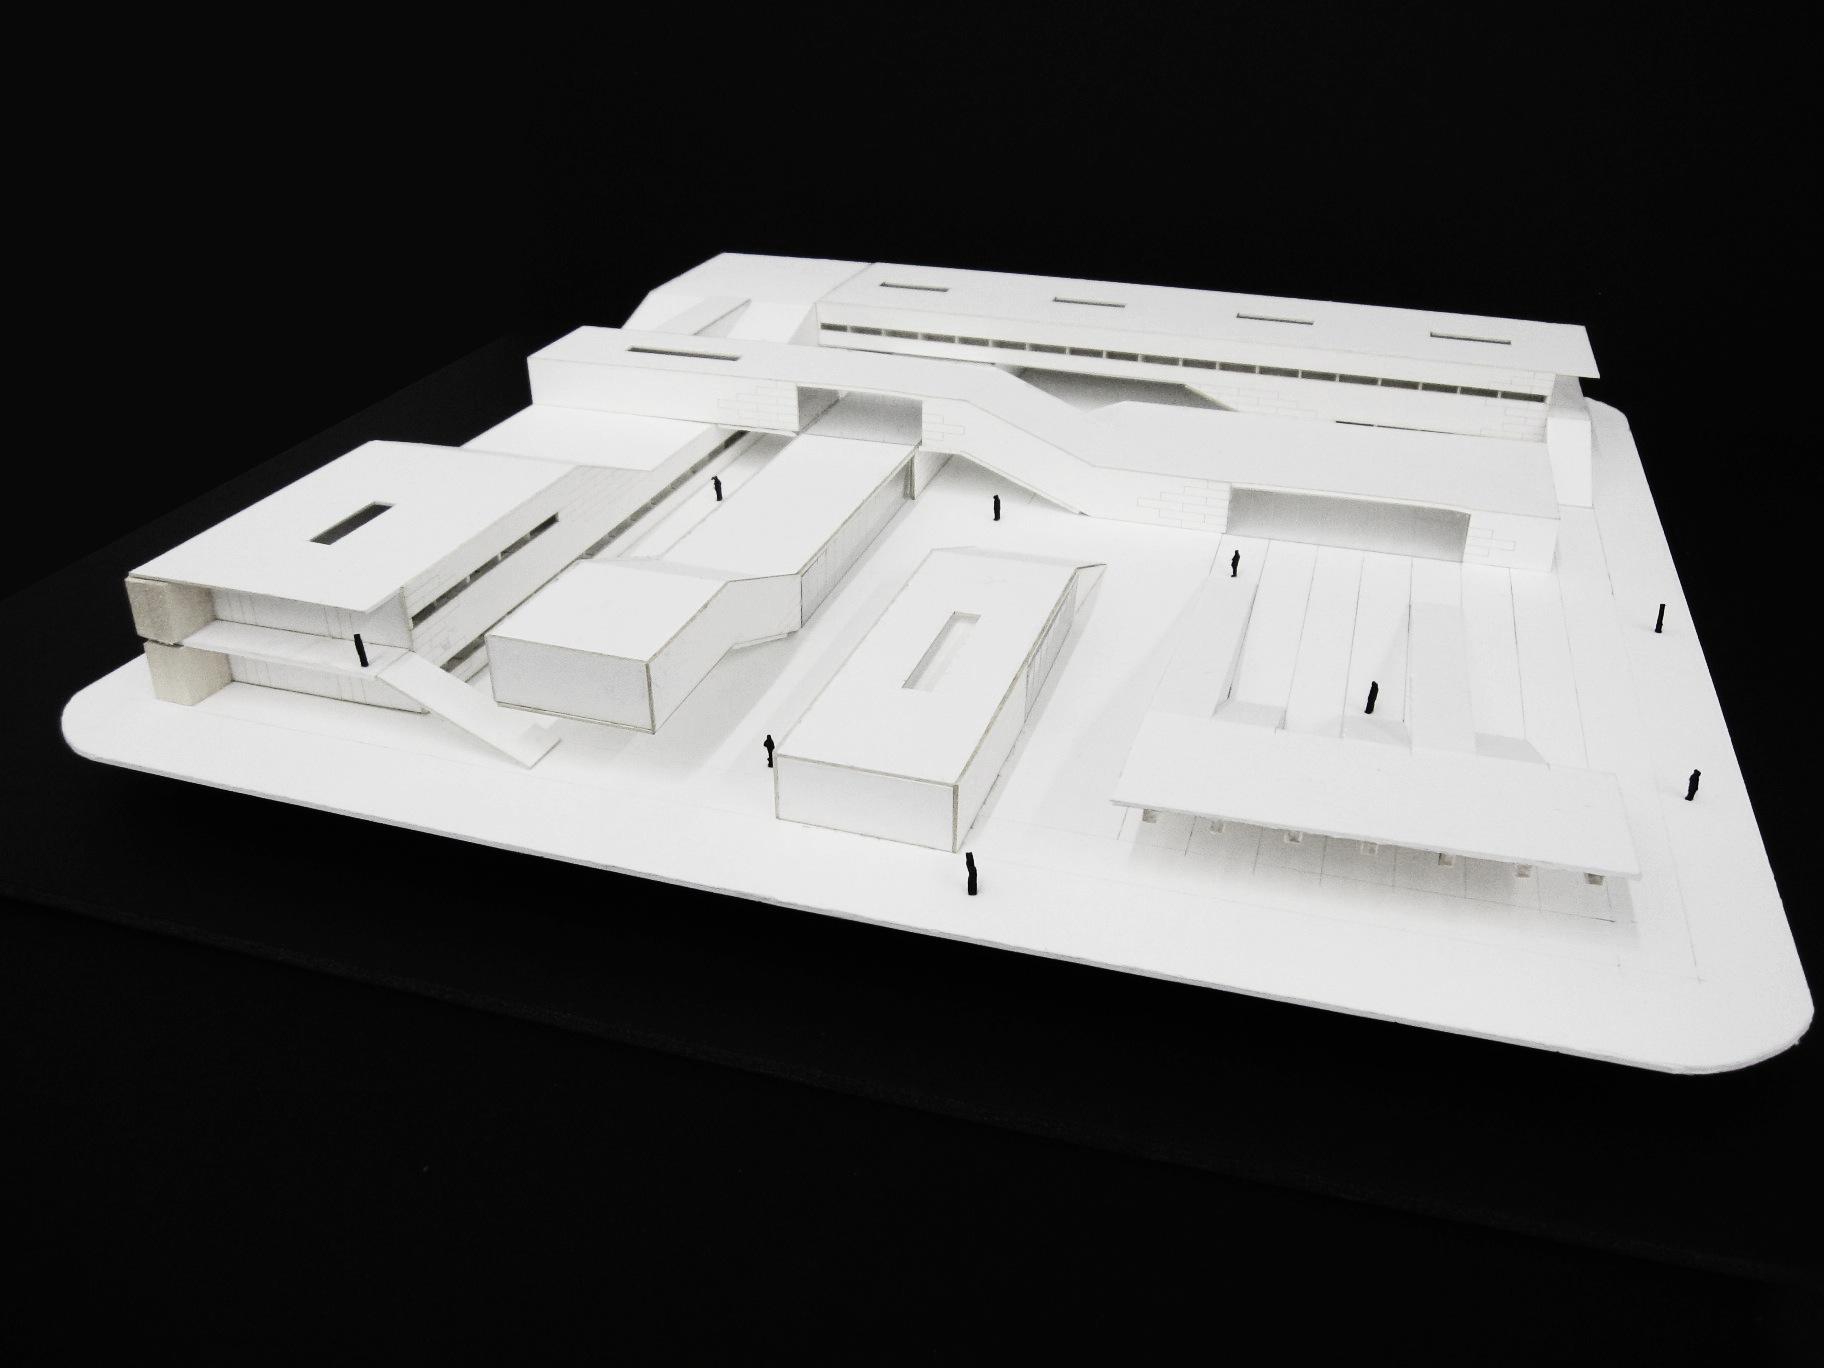 mikrokosmos prison model 1